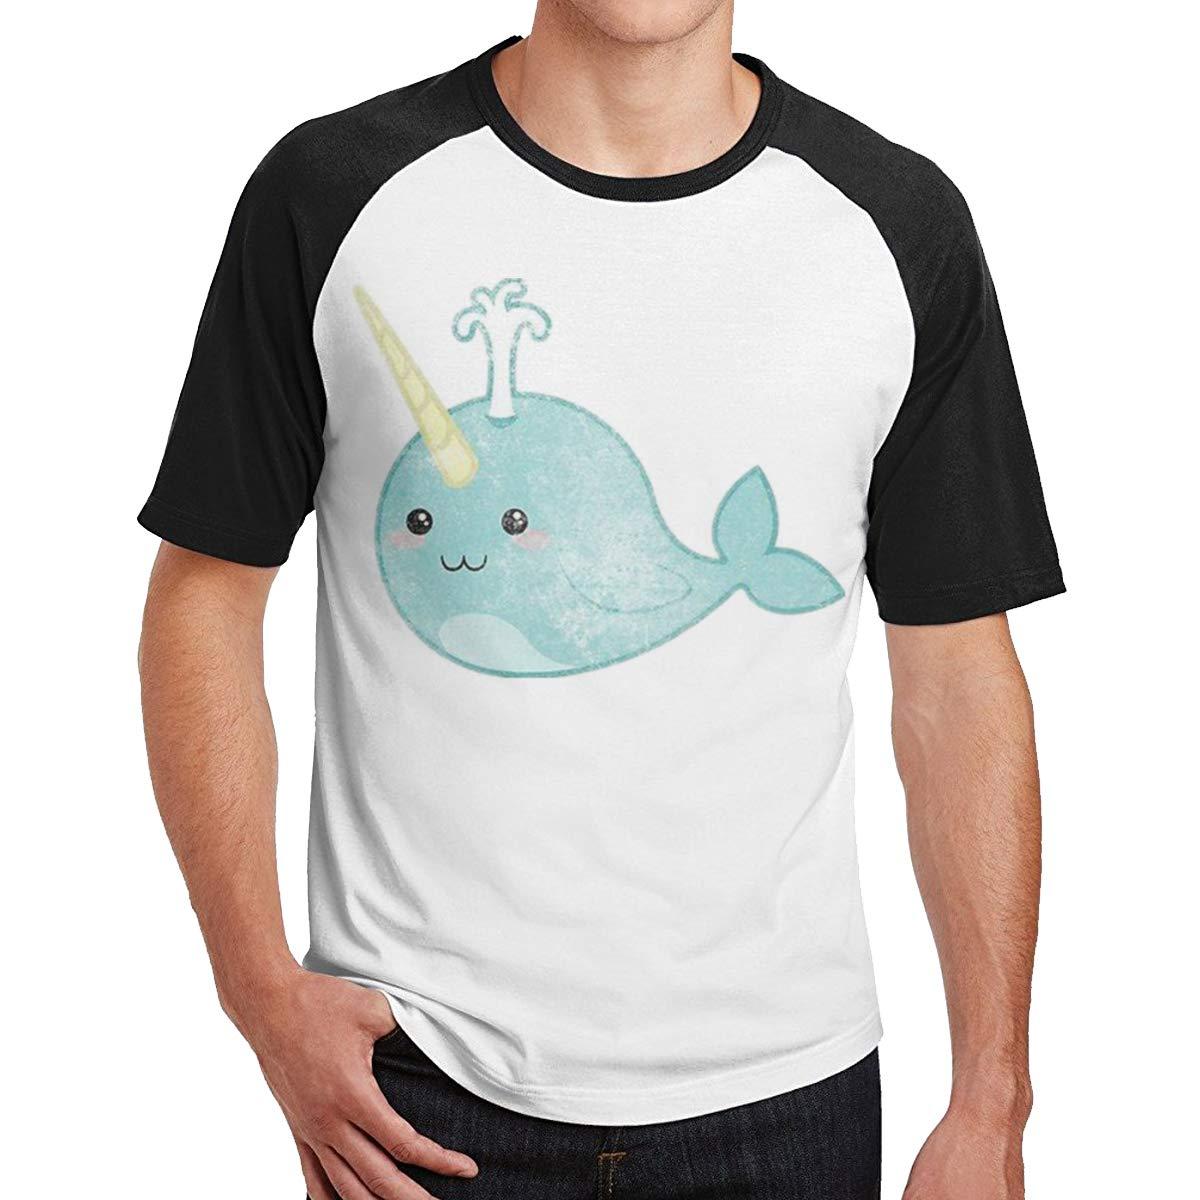 ALWAYSUV Mens Design with Vintage Narwhal Weekend Vintage Narwhal Short Sleeve T-Shirt